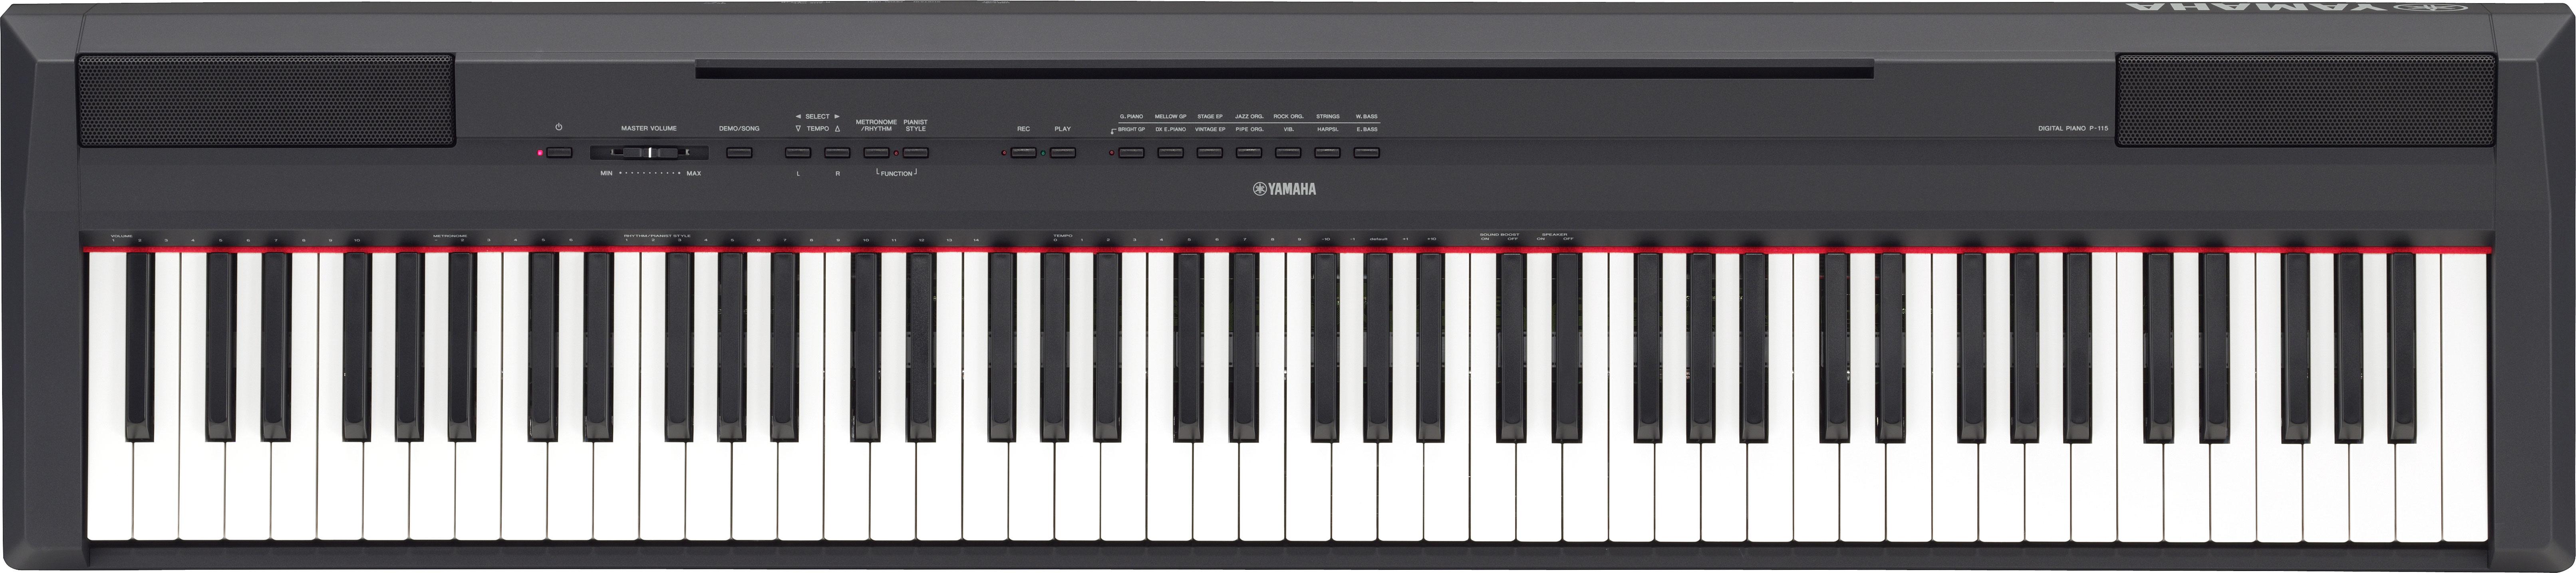 Yamaha P-115B digitális színpadi zongora